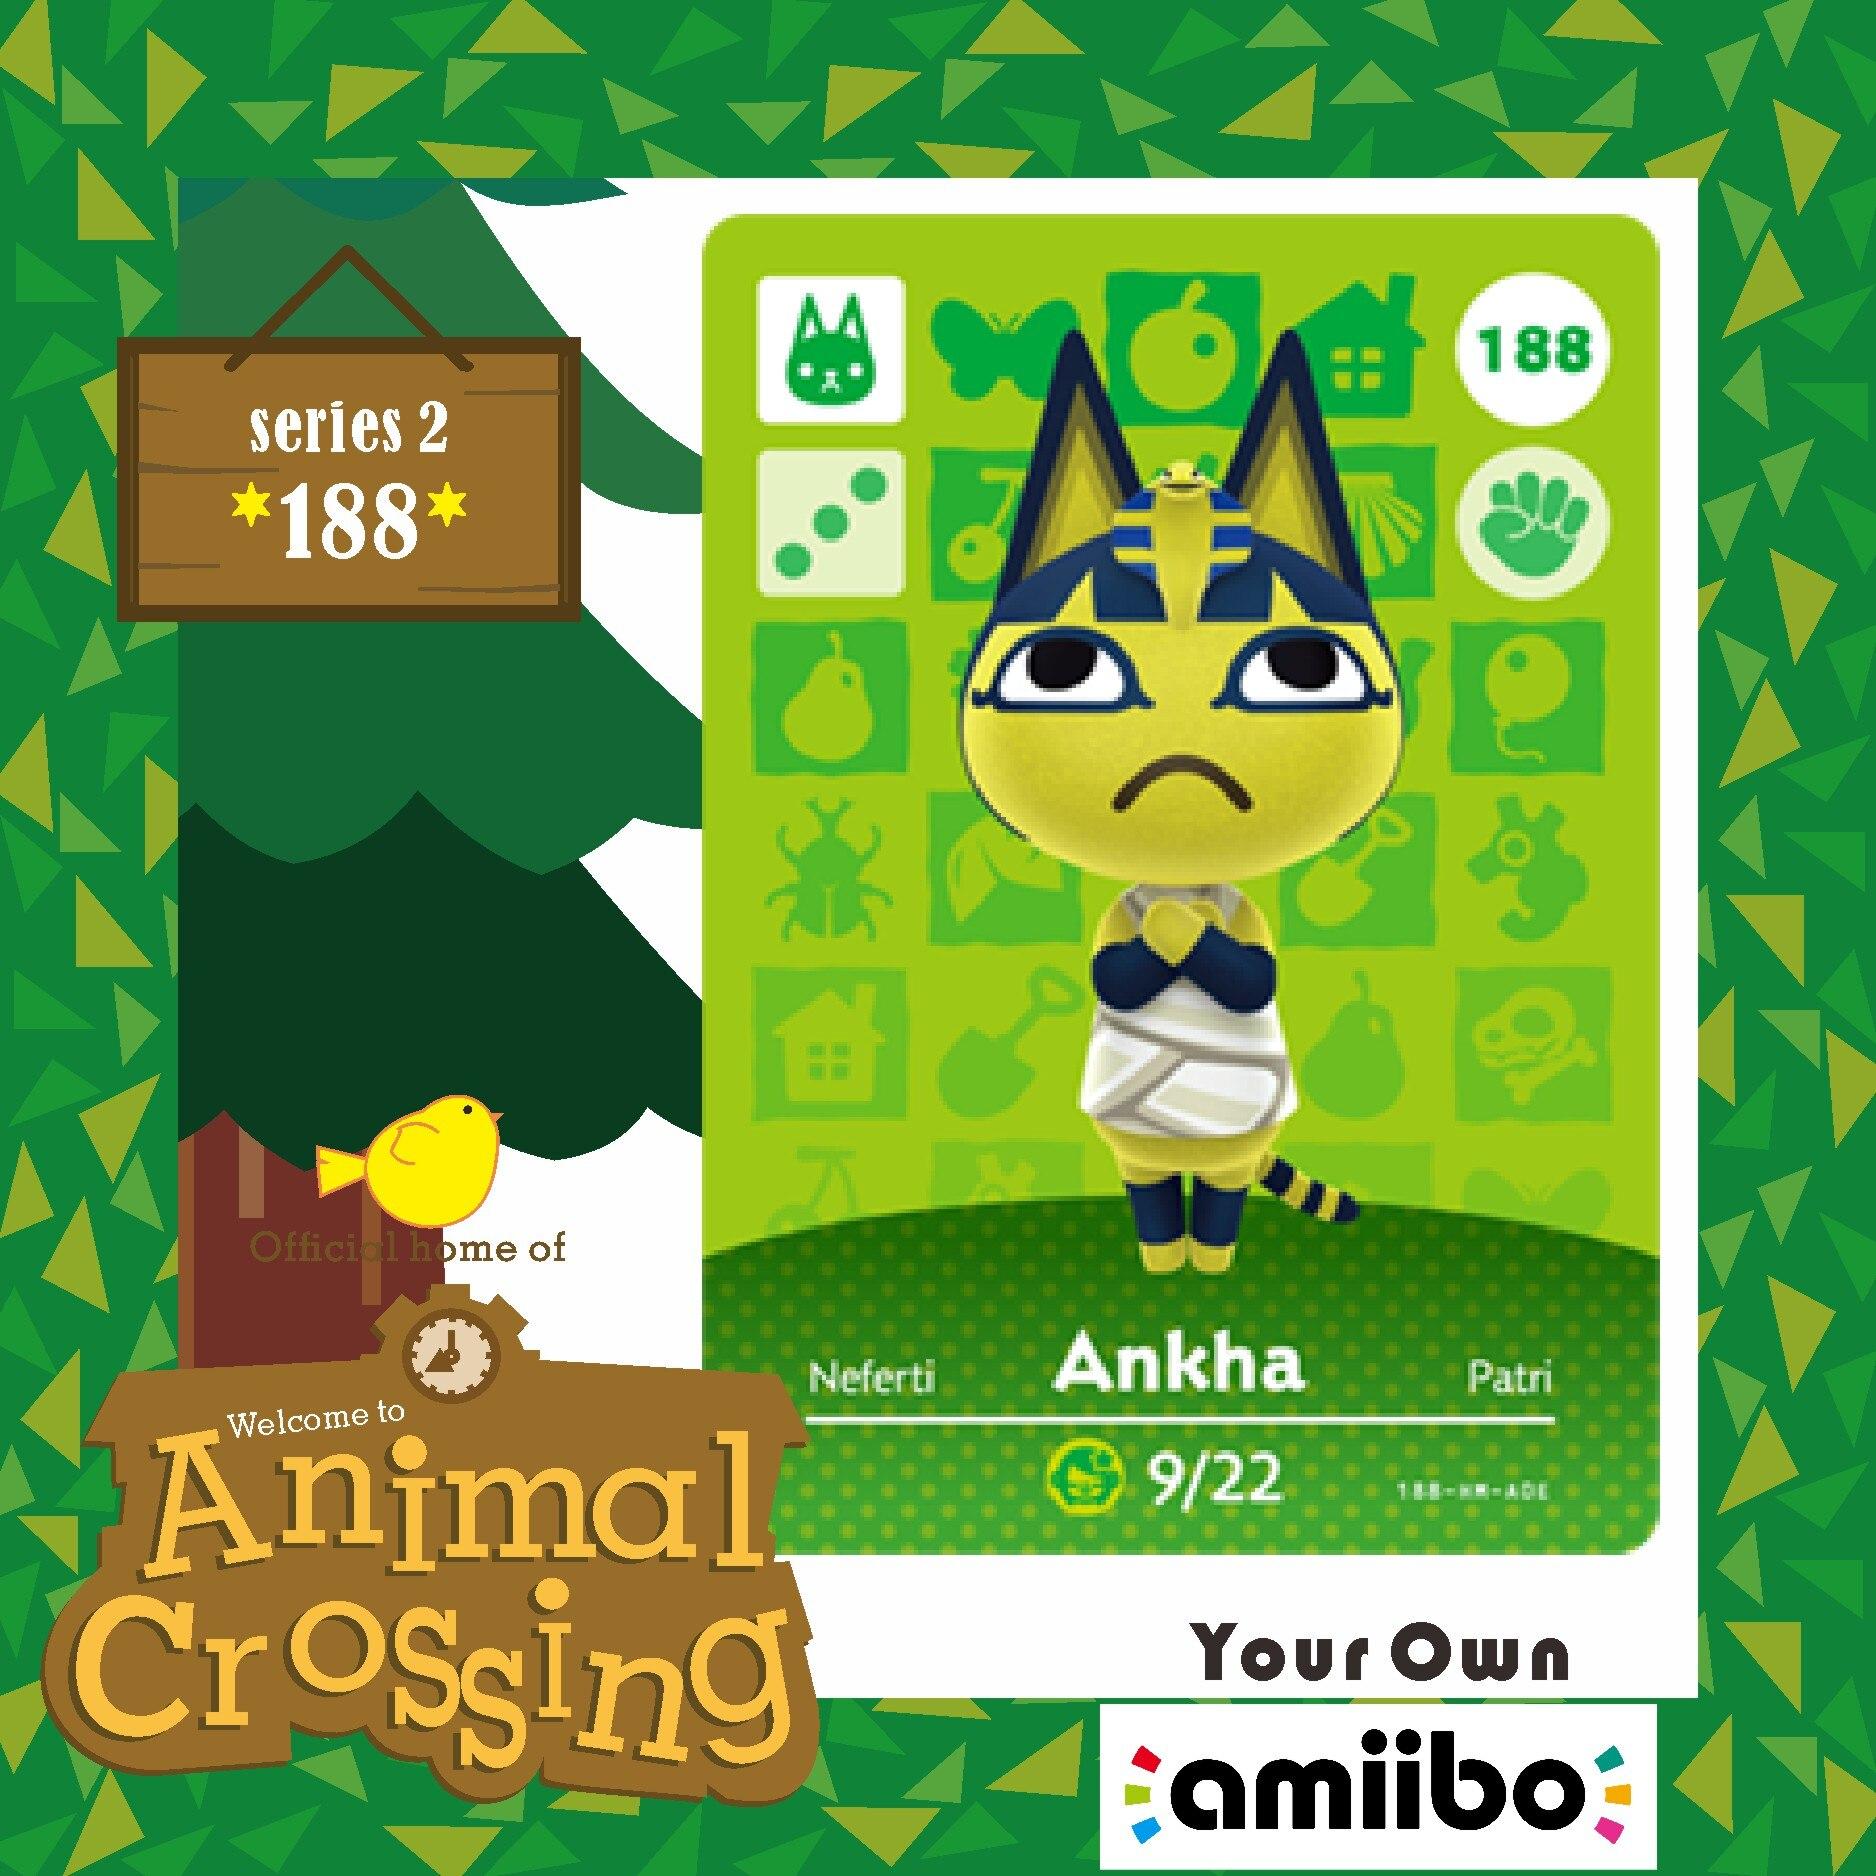 Welcome Amiibo Animal Crossing New Horizons Villager Card Amiibo Animal Crossing Amiibo Ankha 188 For NS Game Season Series 2